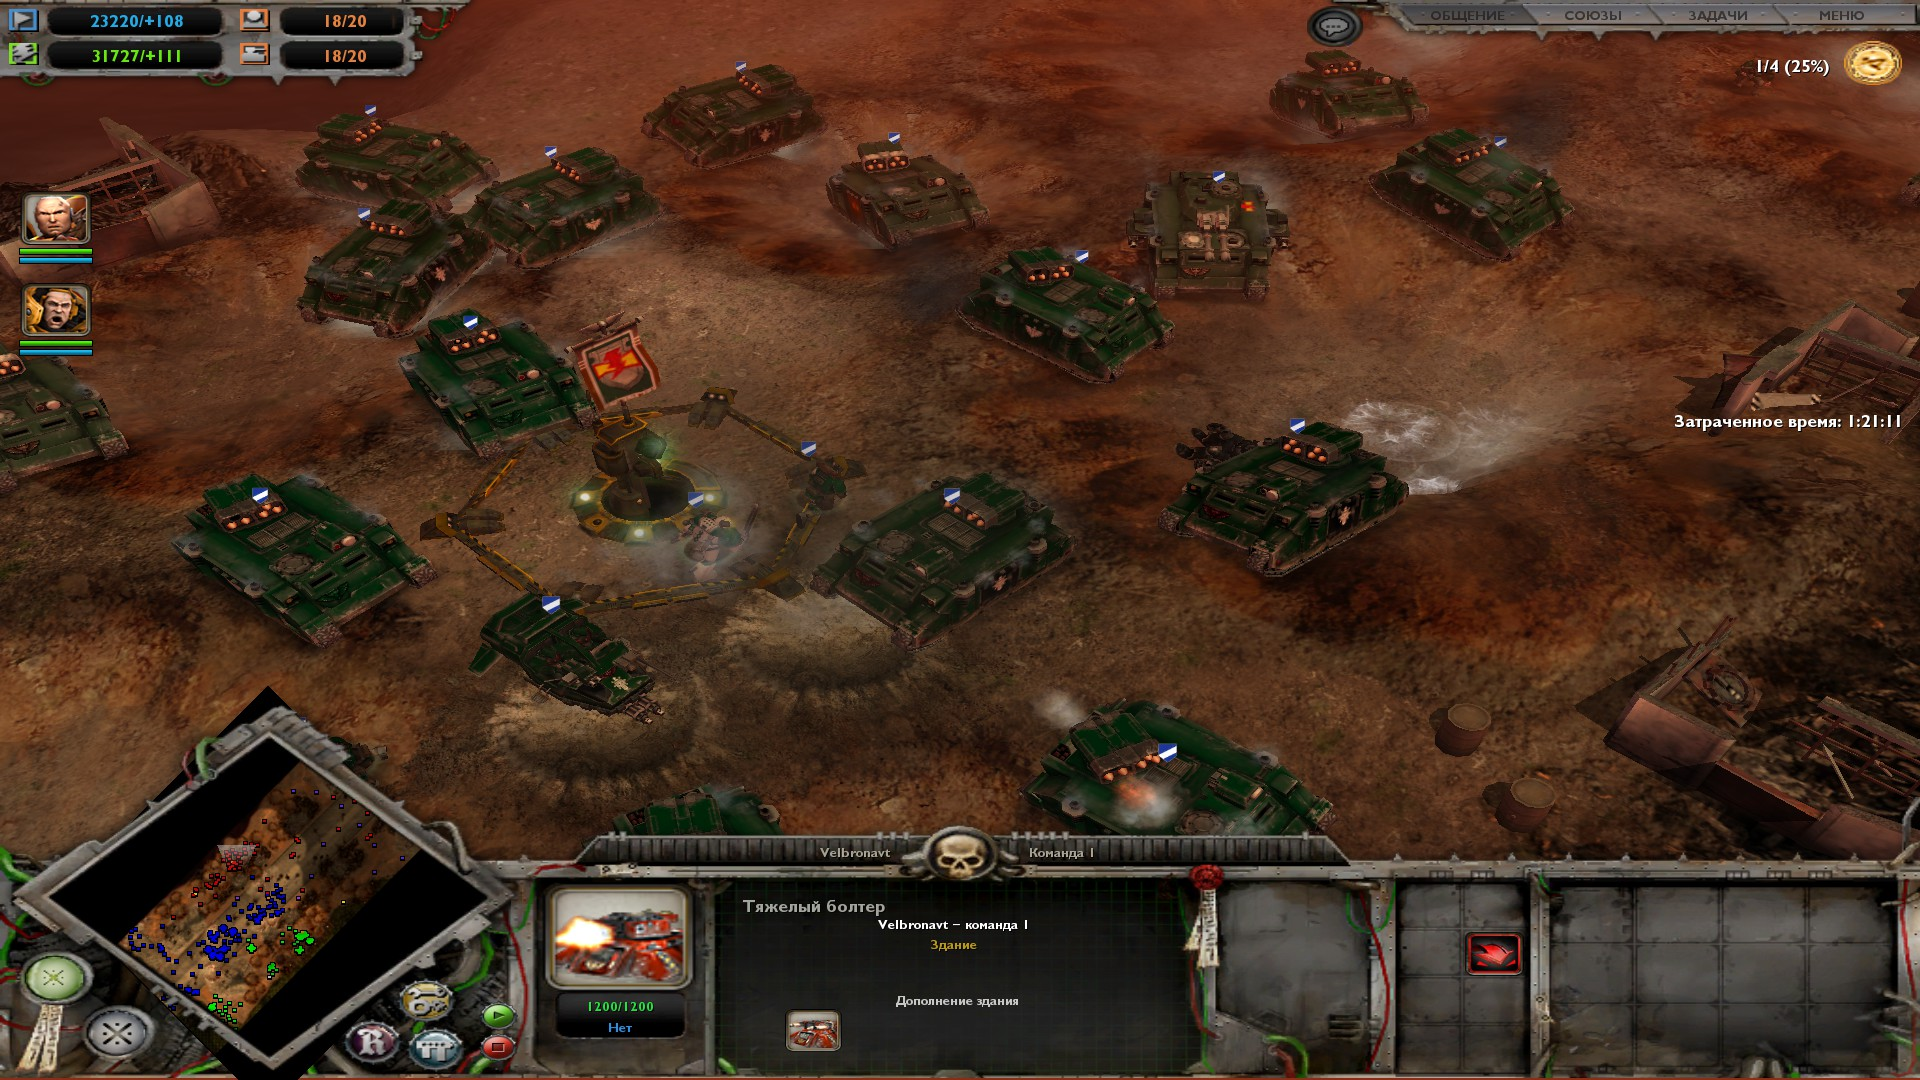 Скоро будет бомбёжка пентагона) - Warhammer 40.000: Dawn of War Битва